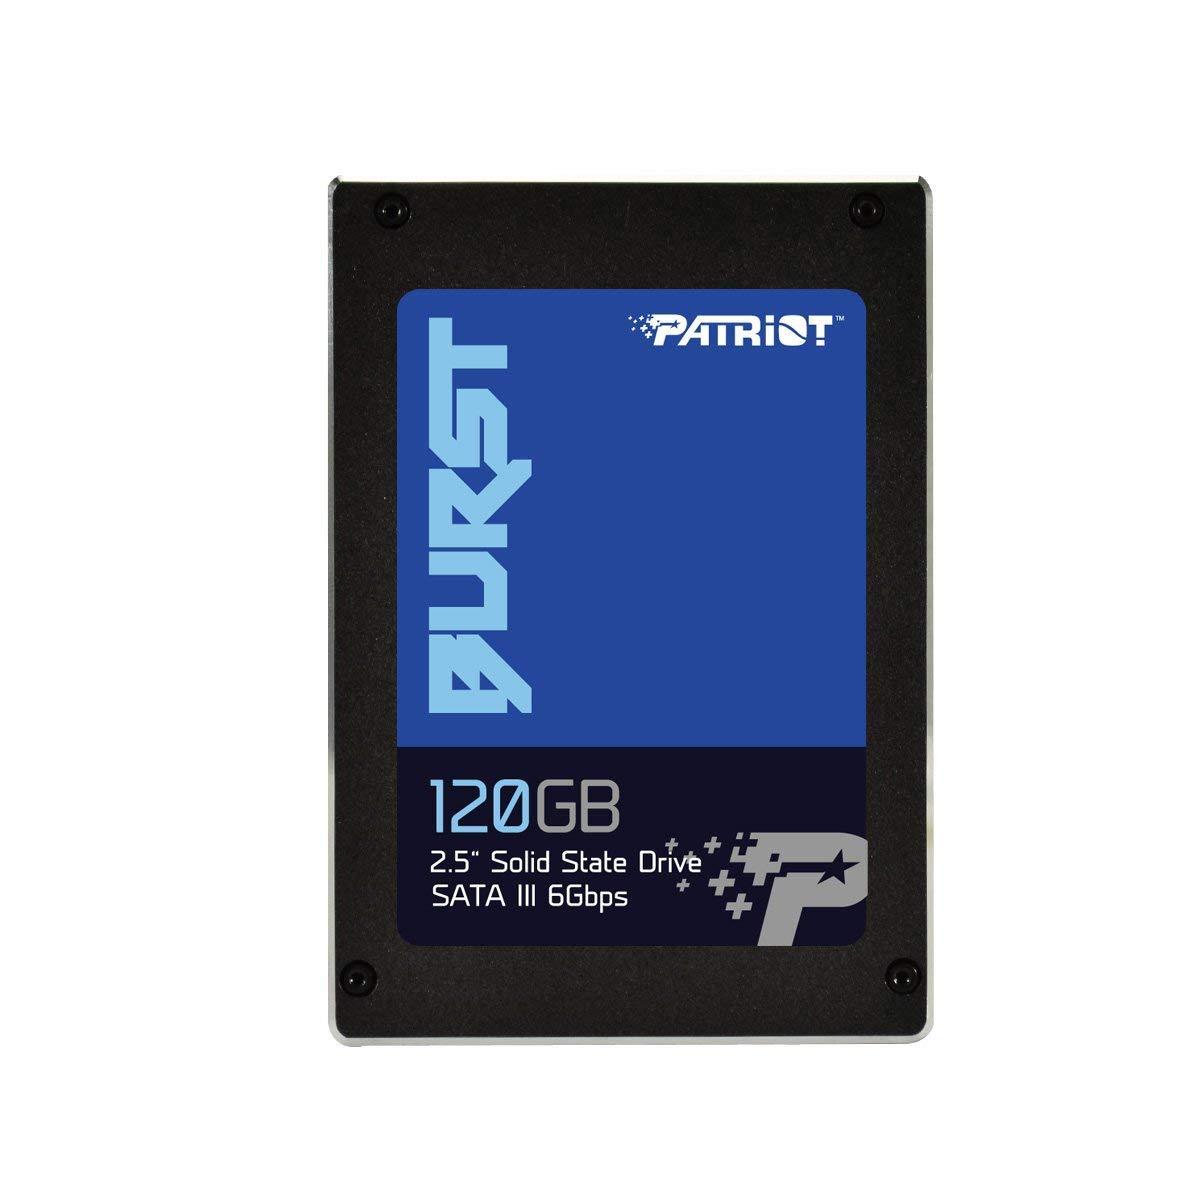 "Patriot Memory Burst SSD 120GB SATA III Internal Solid State Drive 2.5"" - PBU120GS25SSDR"